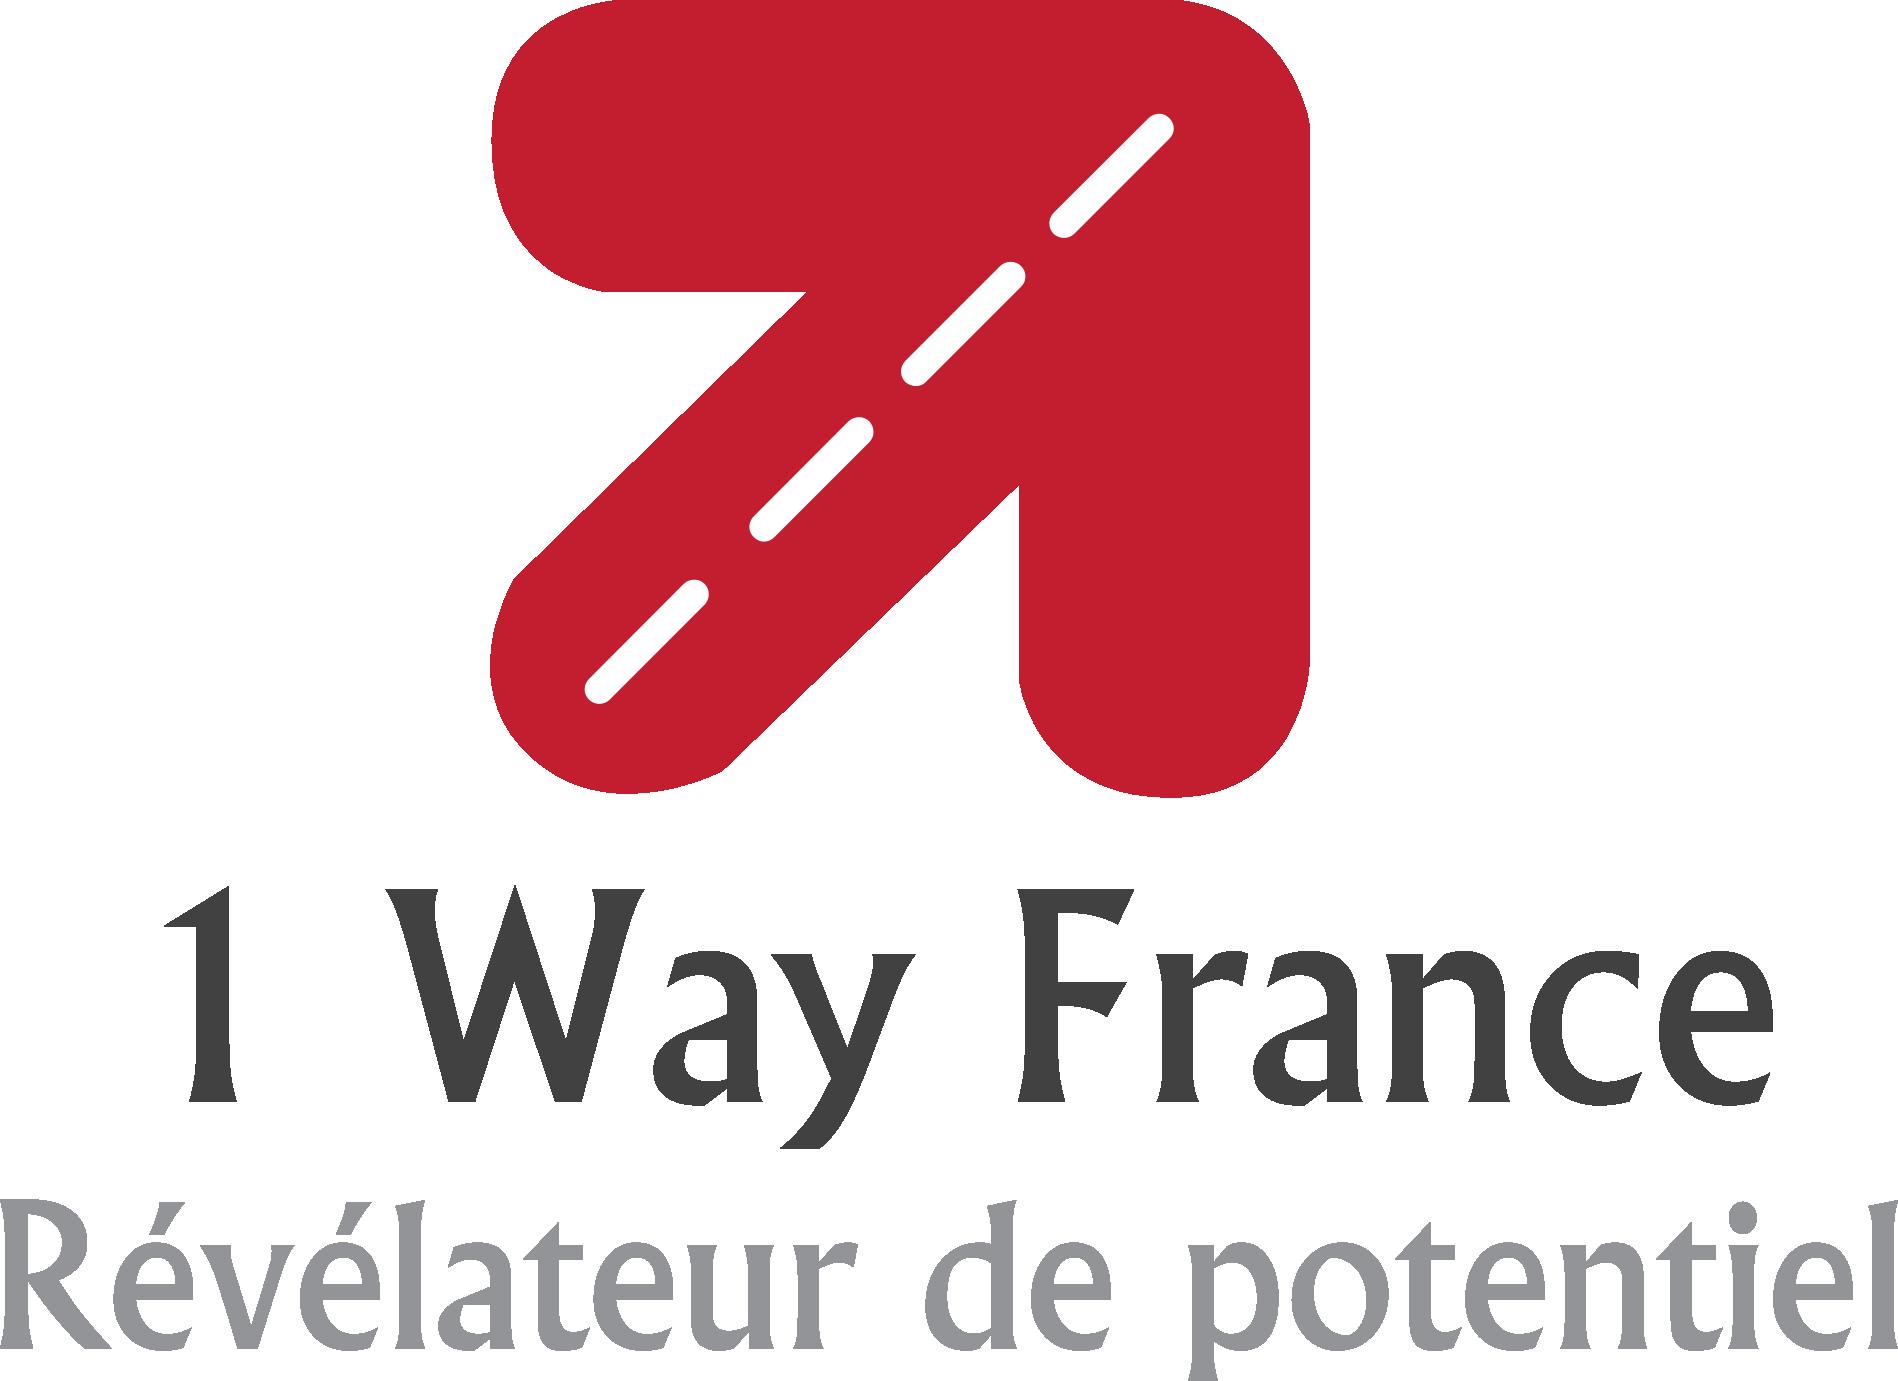 1 Way France